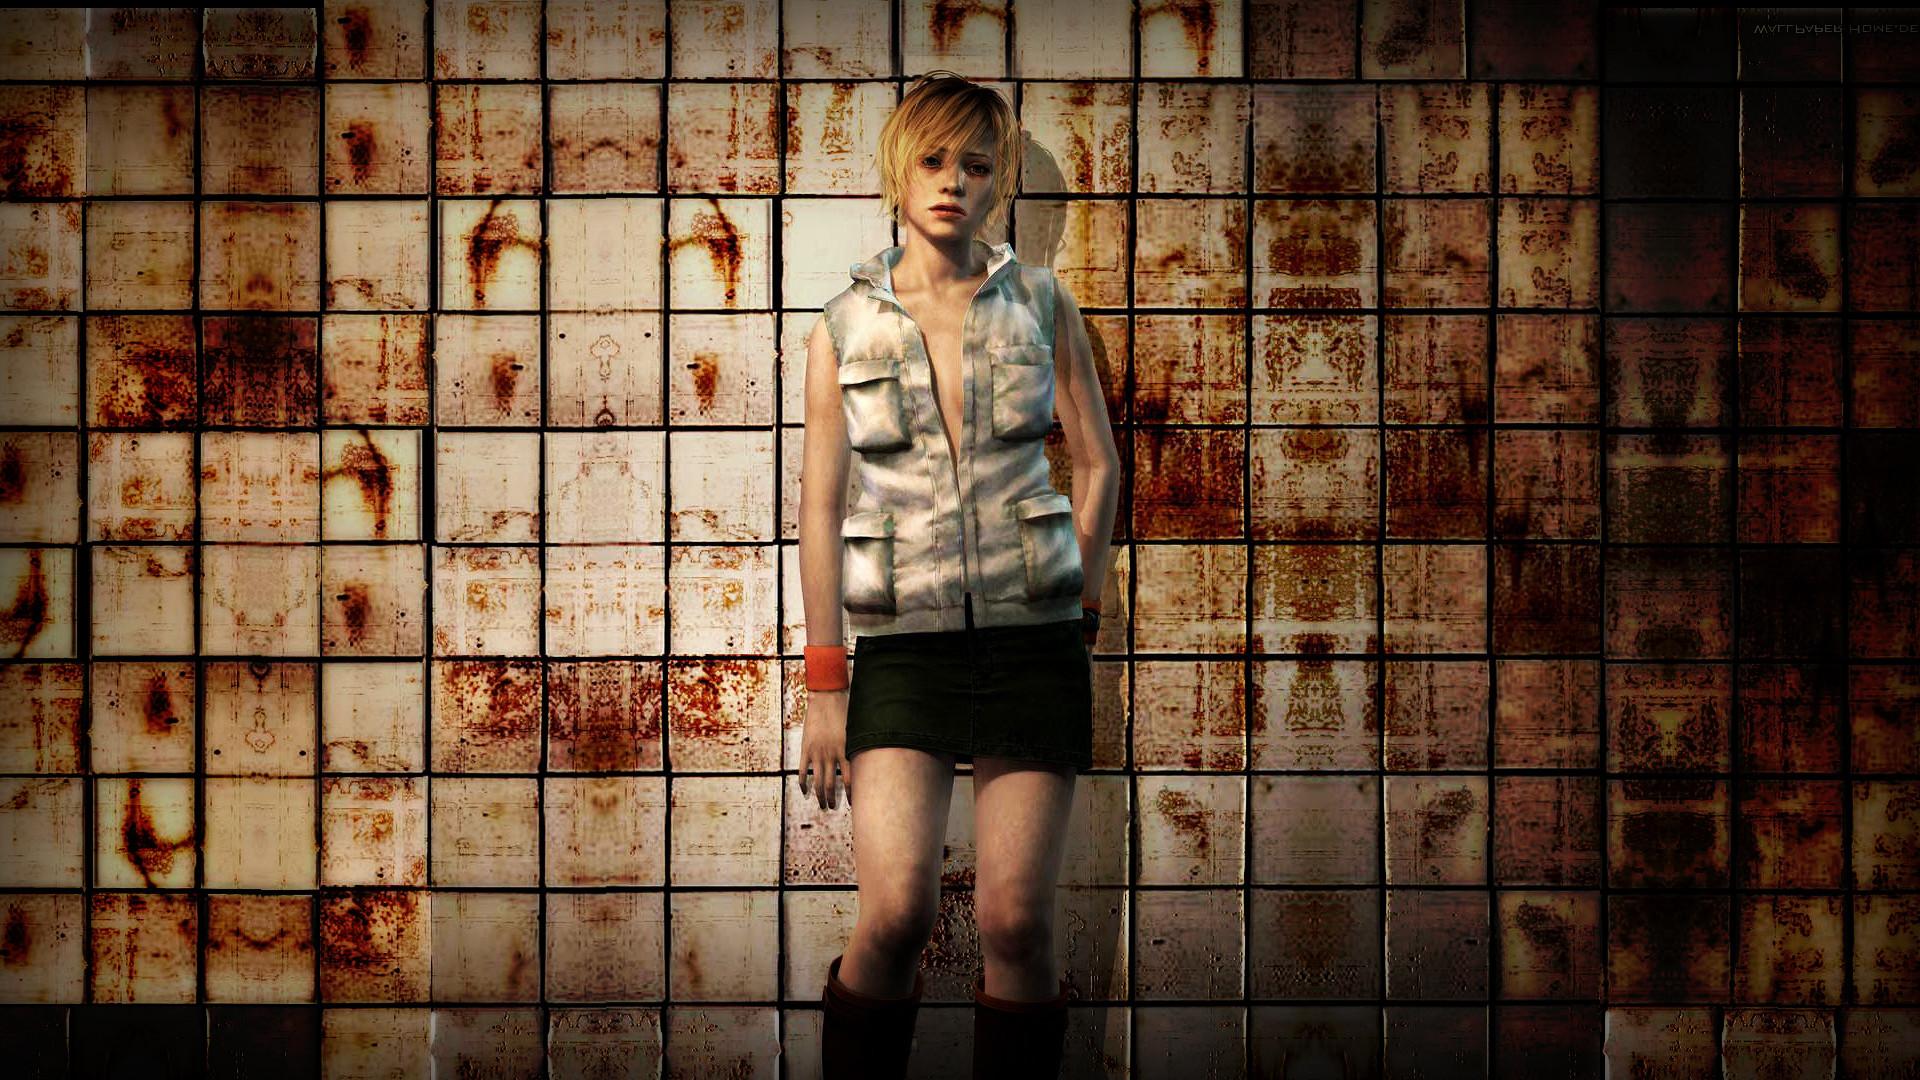 Silent Hill 3 Wallpaper (67+ images)